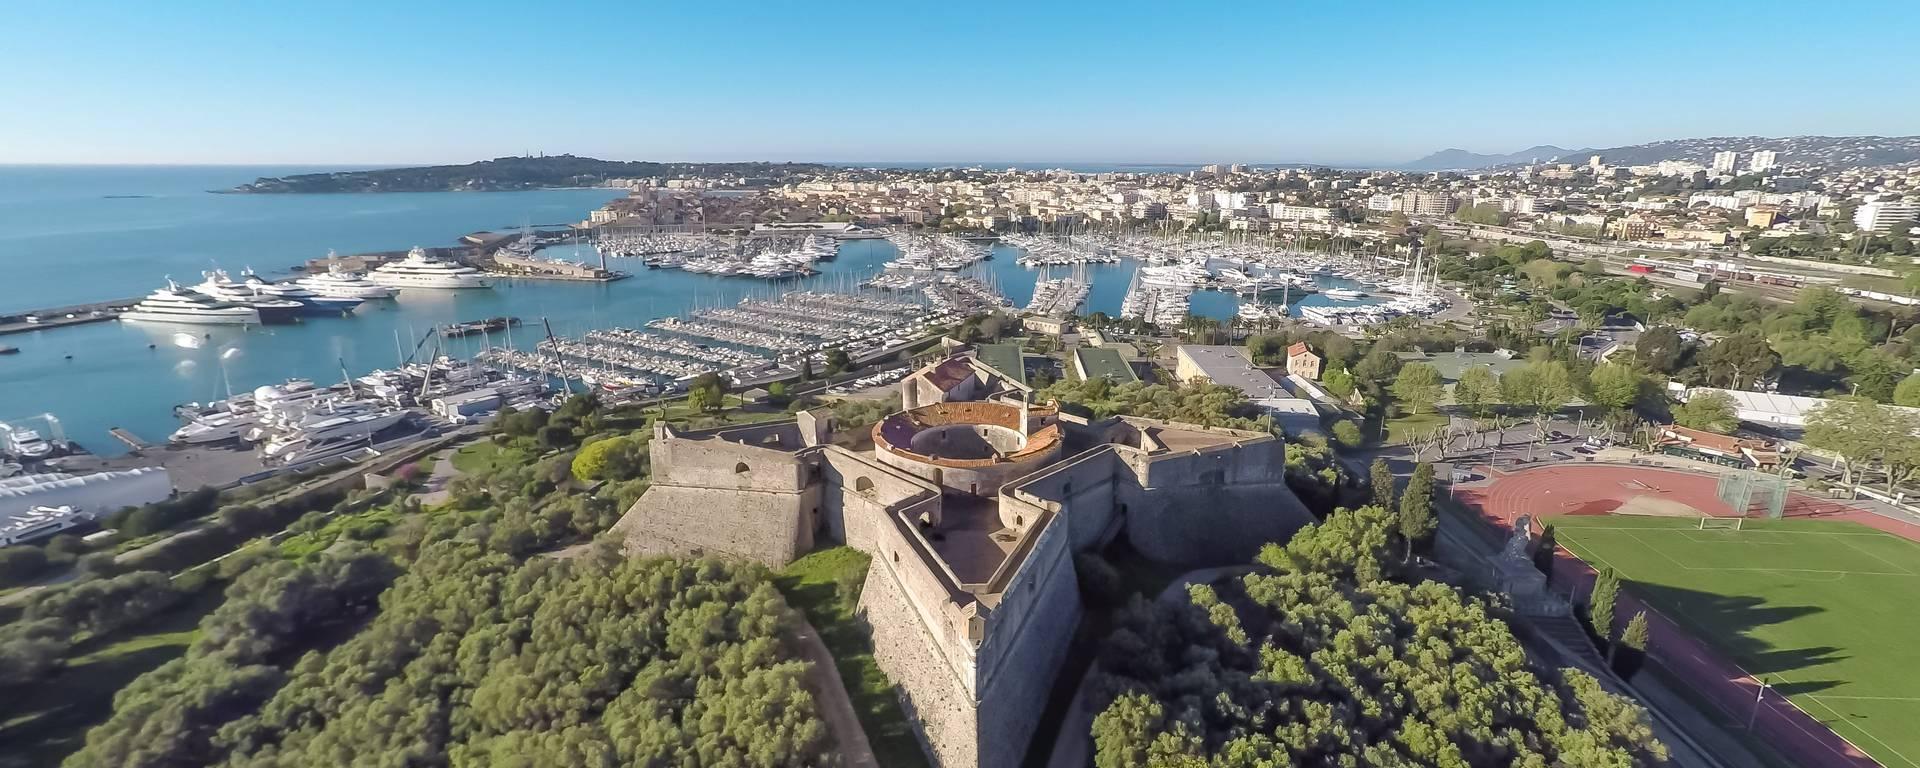 Il Fort Carré ©Mairie d'Antibes -JF Diaz